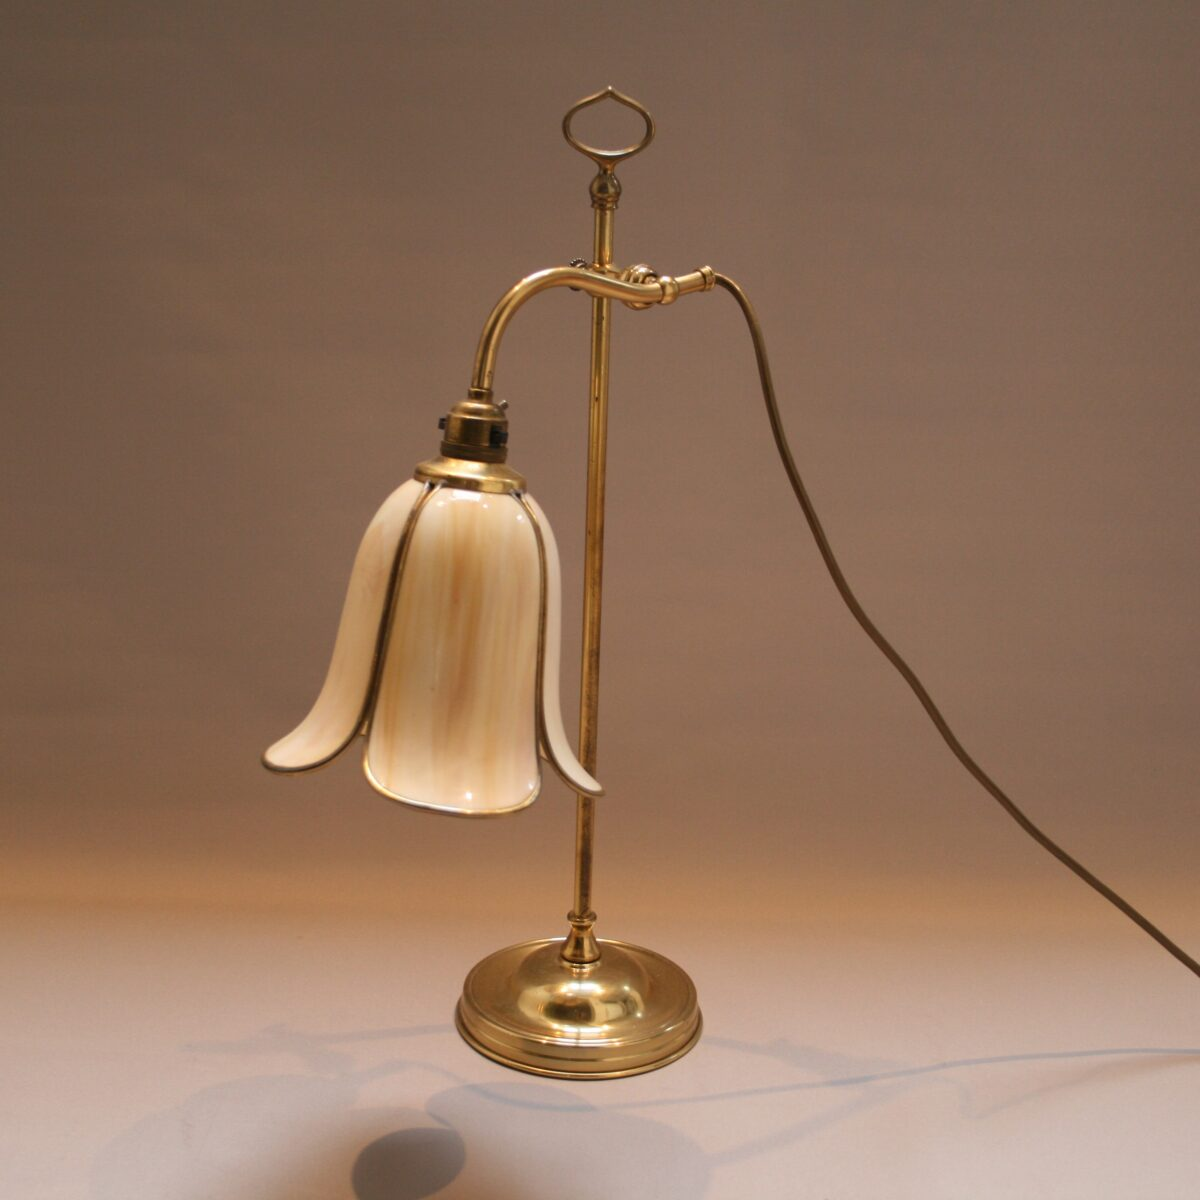 Edwardian brass and glass desk lamp/williamsantiques